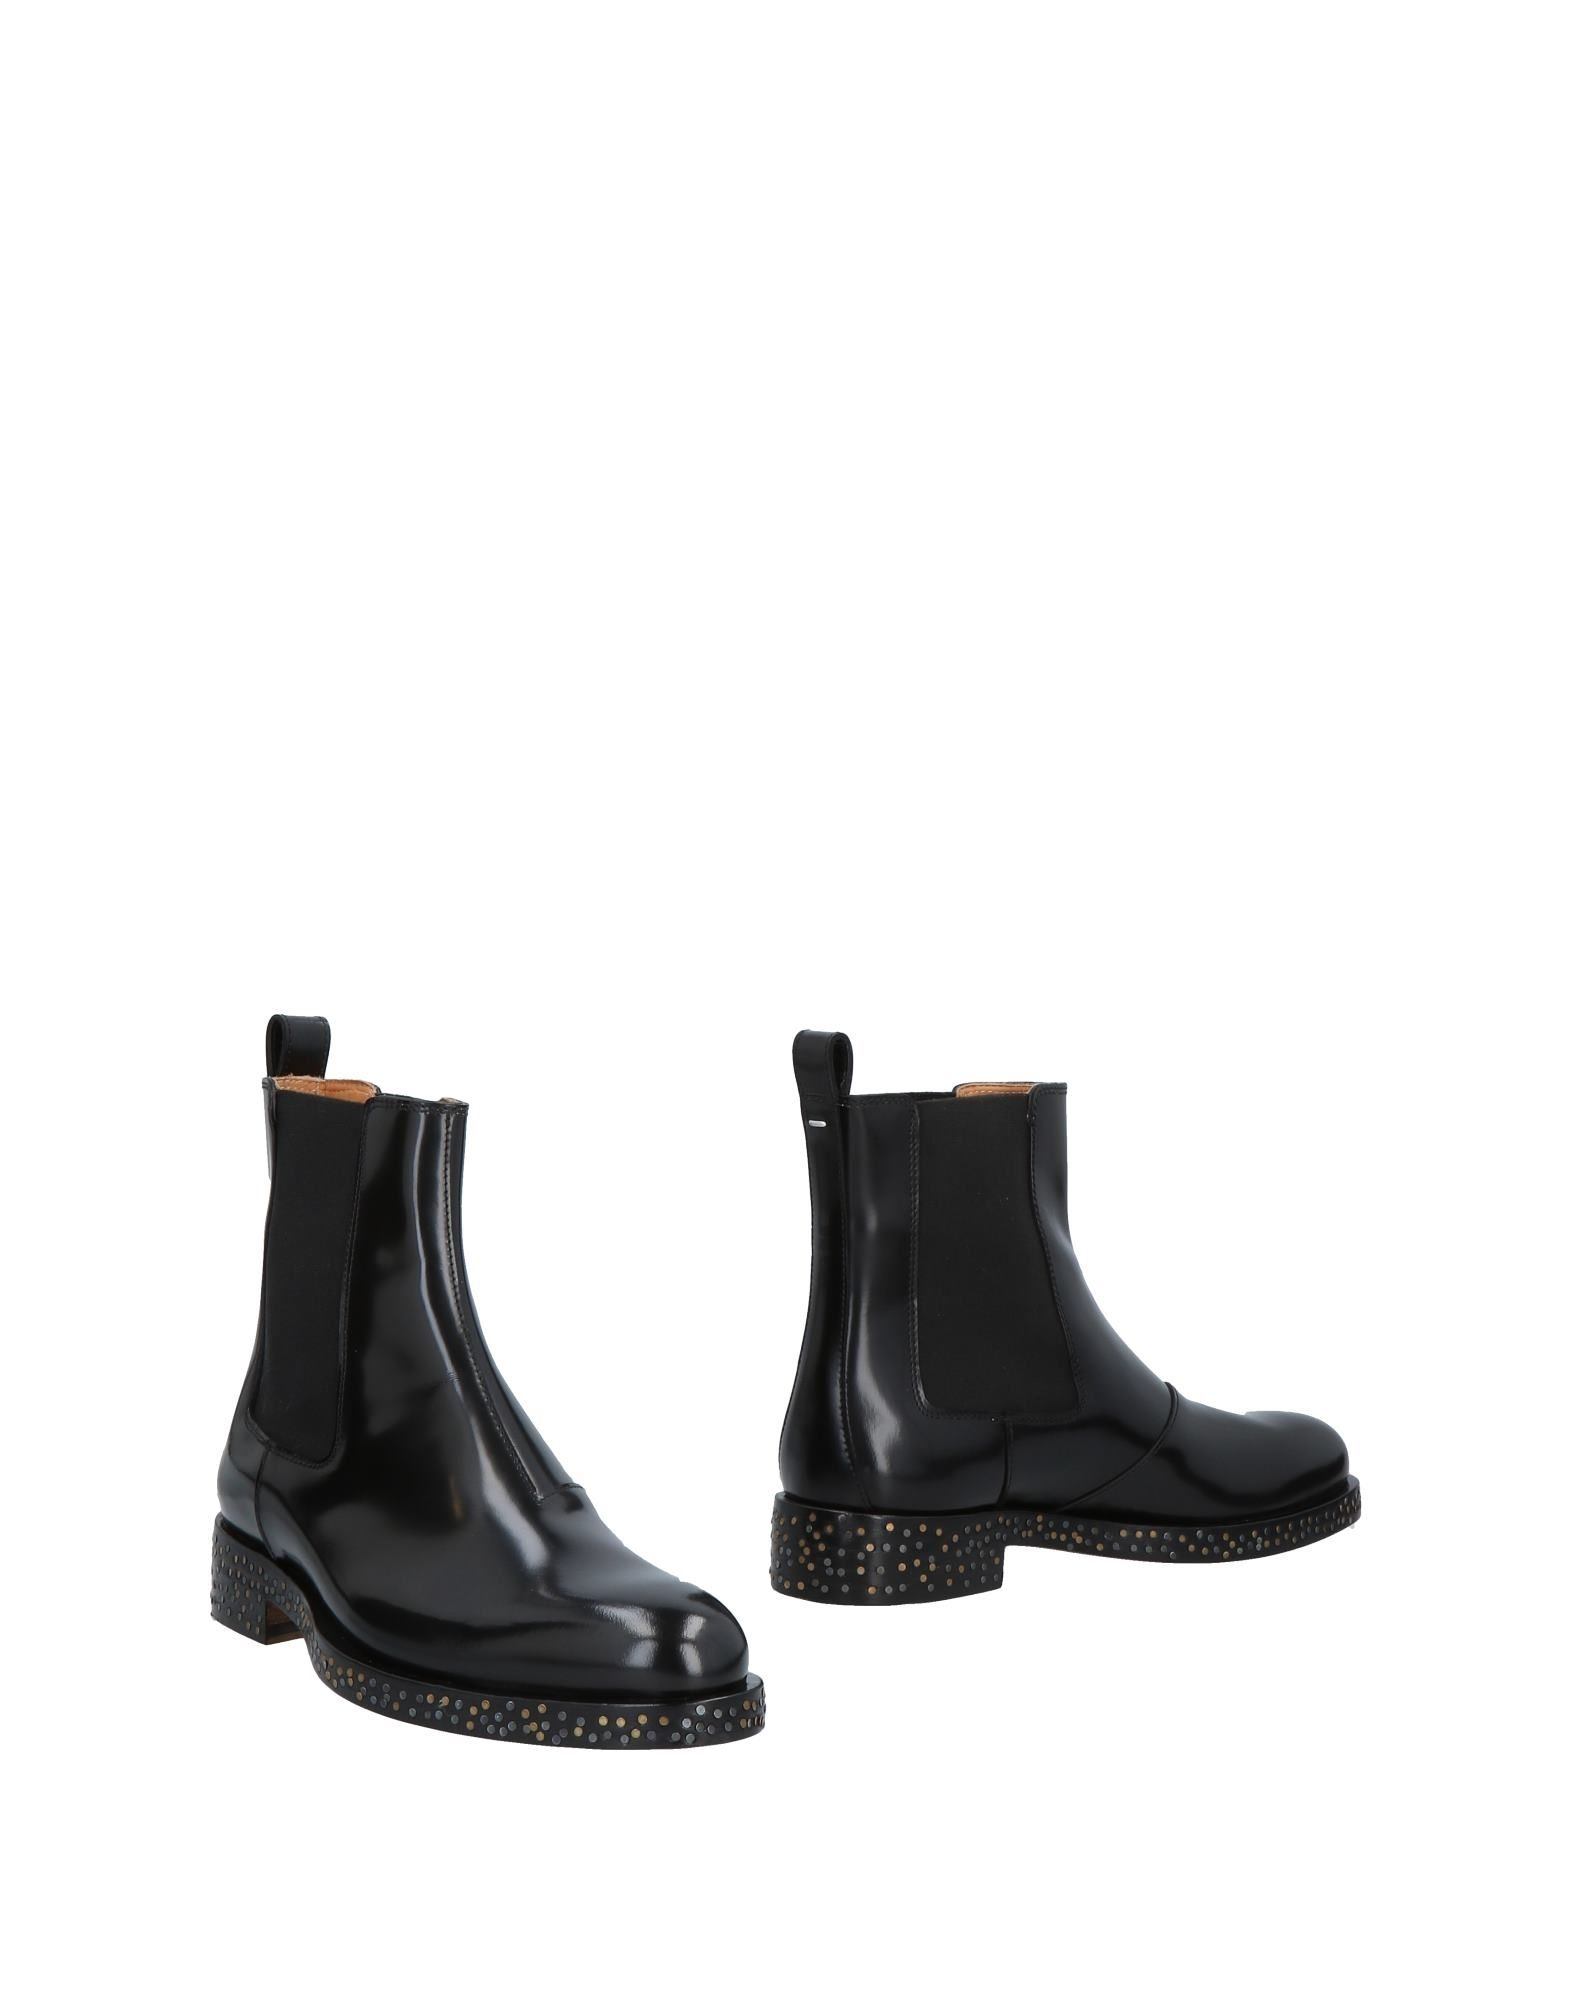 Maison Margiela Chelsea Boots Damen Schuhe  11492506SMGünstige gut aussehende Schuhe Damen 98f6f9